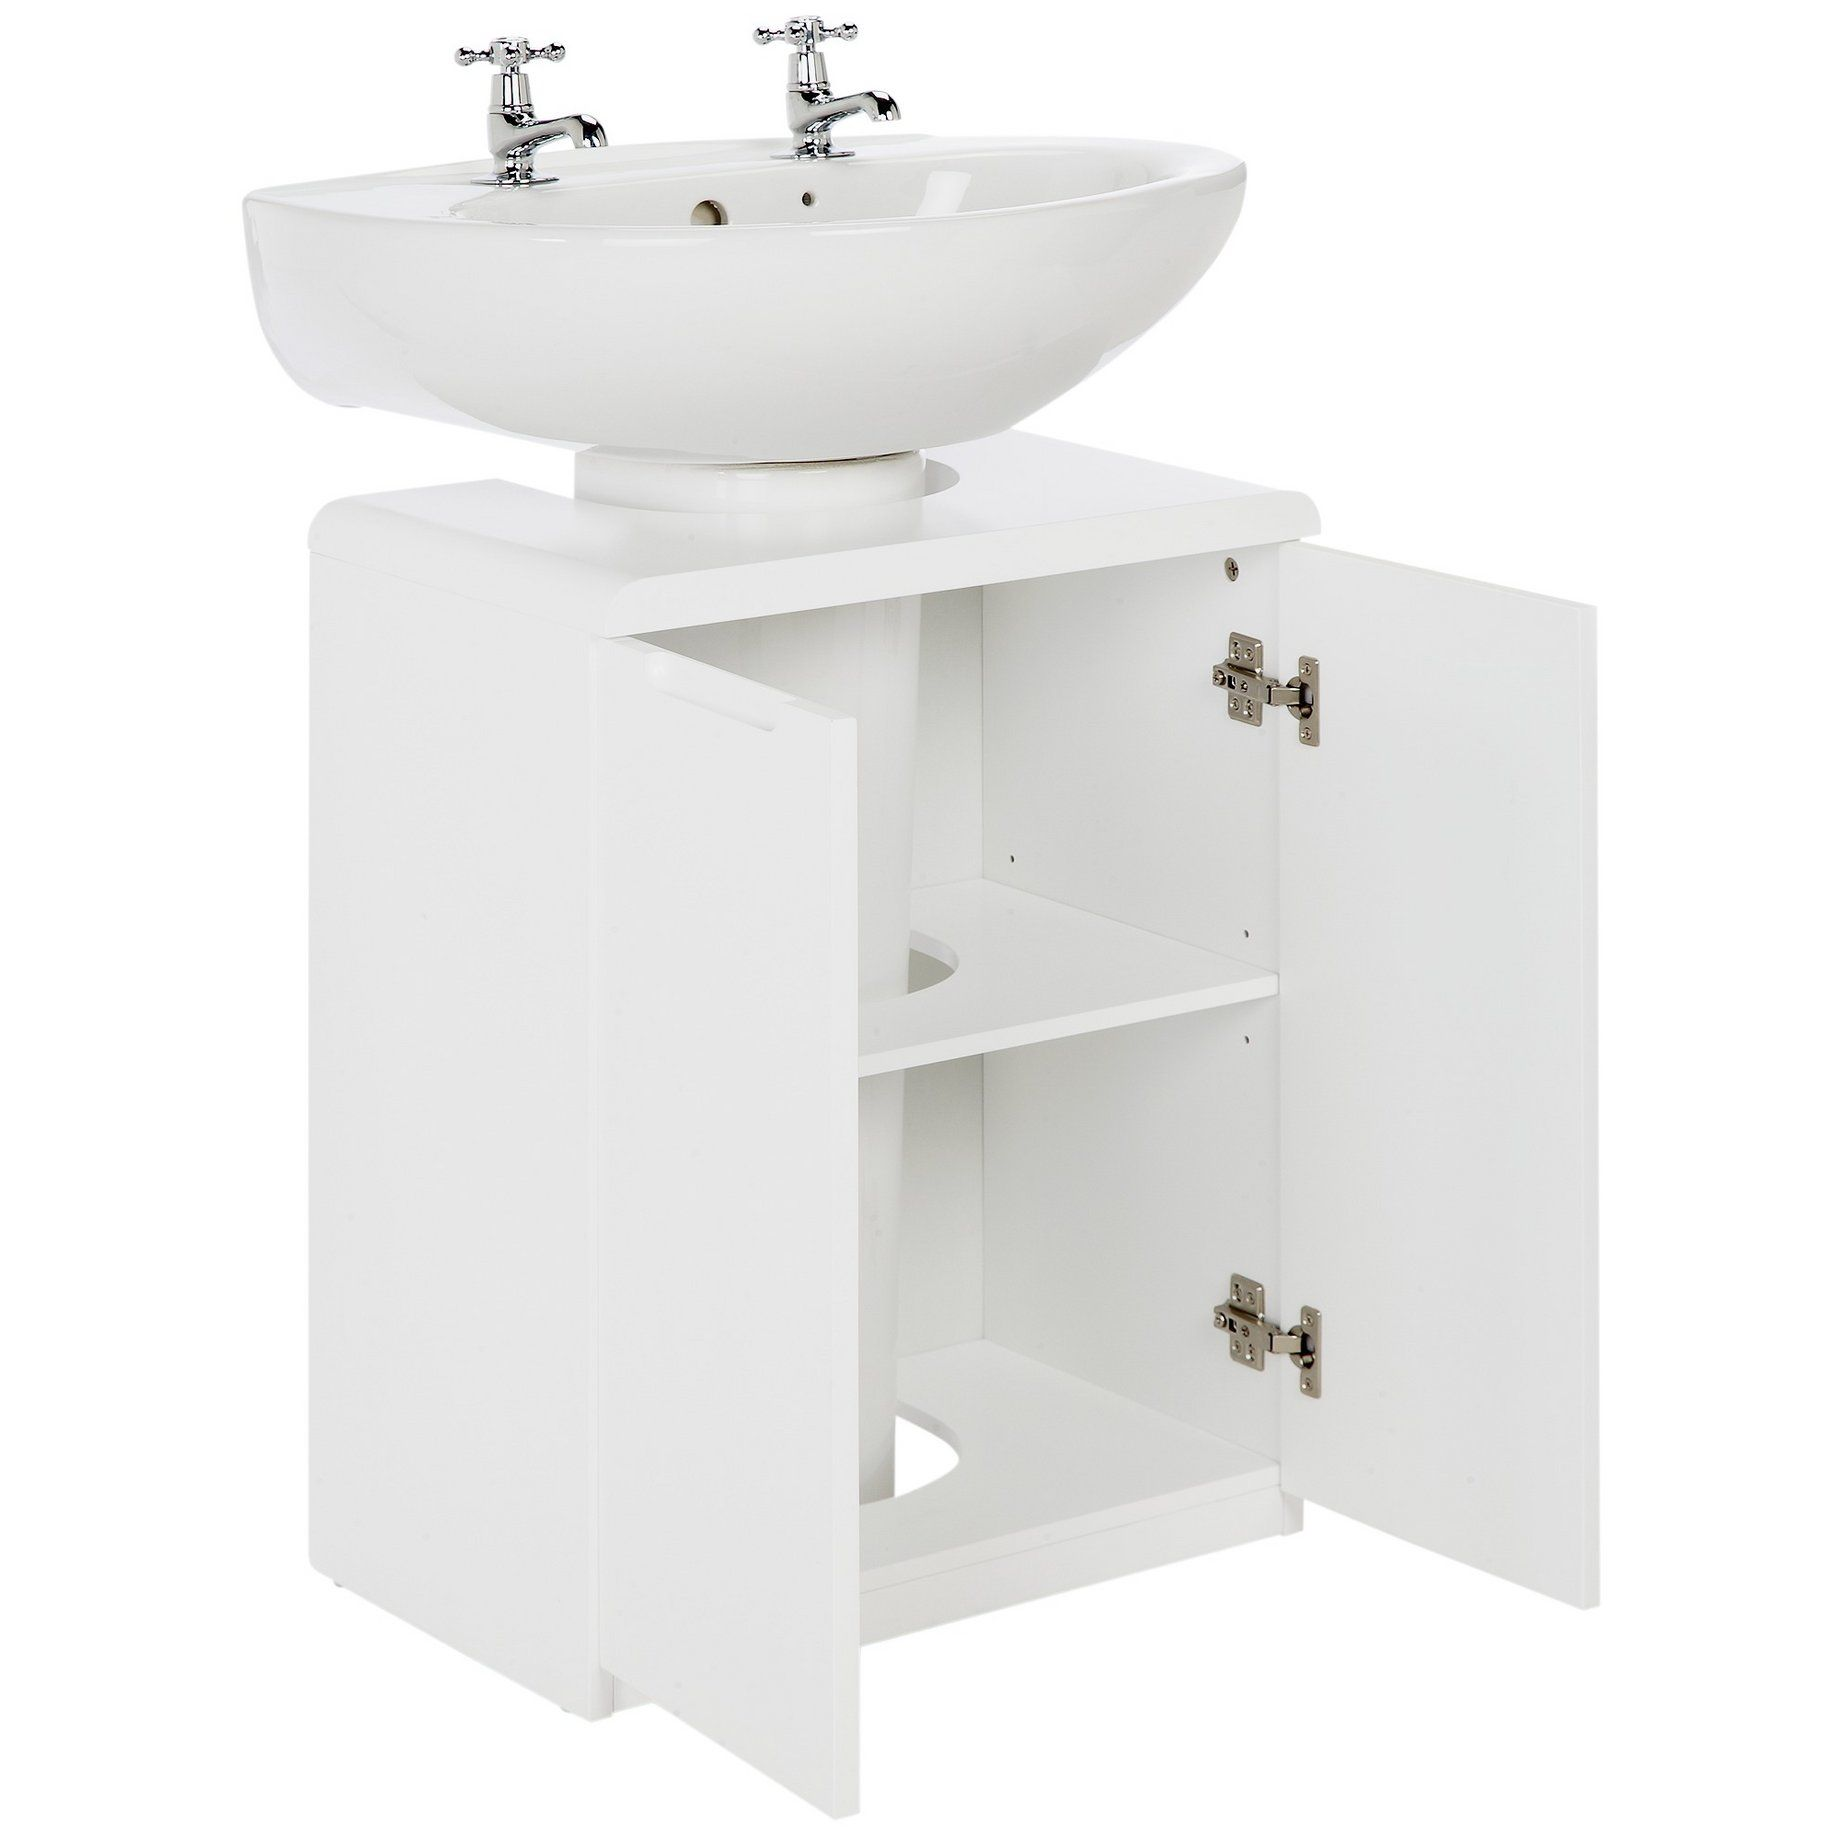 Buy Hygena Curve Under Sink Storage Unit White At Argos Co Uk Your Online Shop For Bathroo Small Bathroom Storage Diy Shelves Bathroom Bathroom Shelf Decor